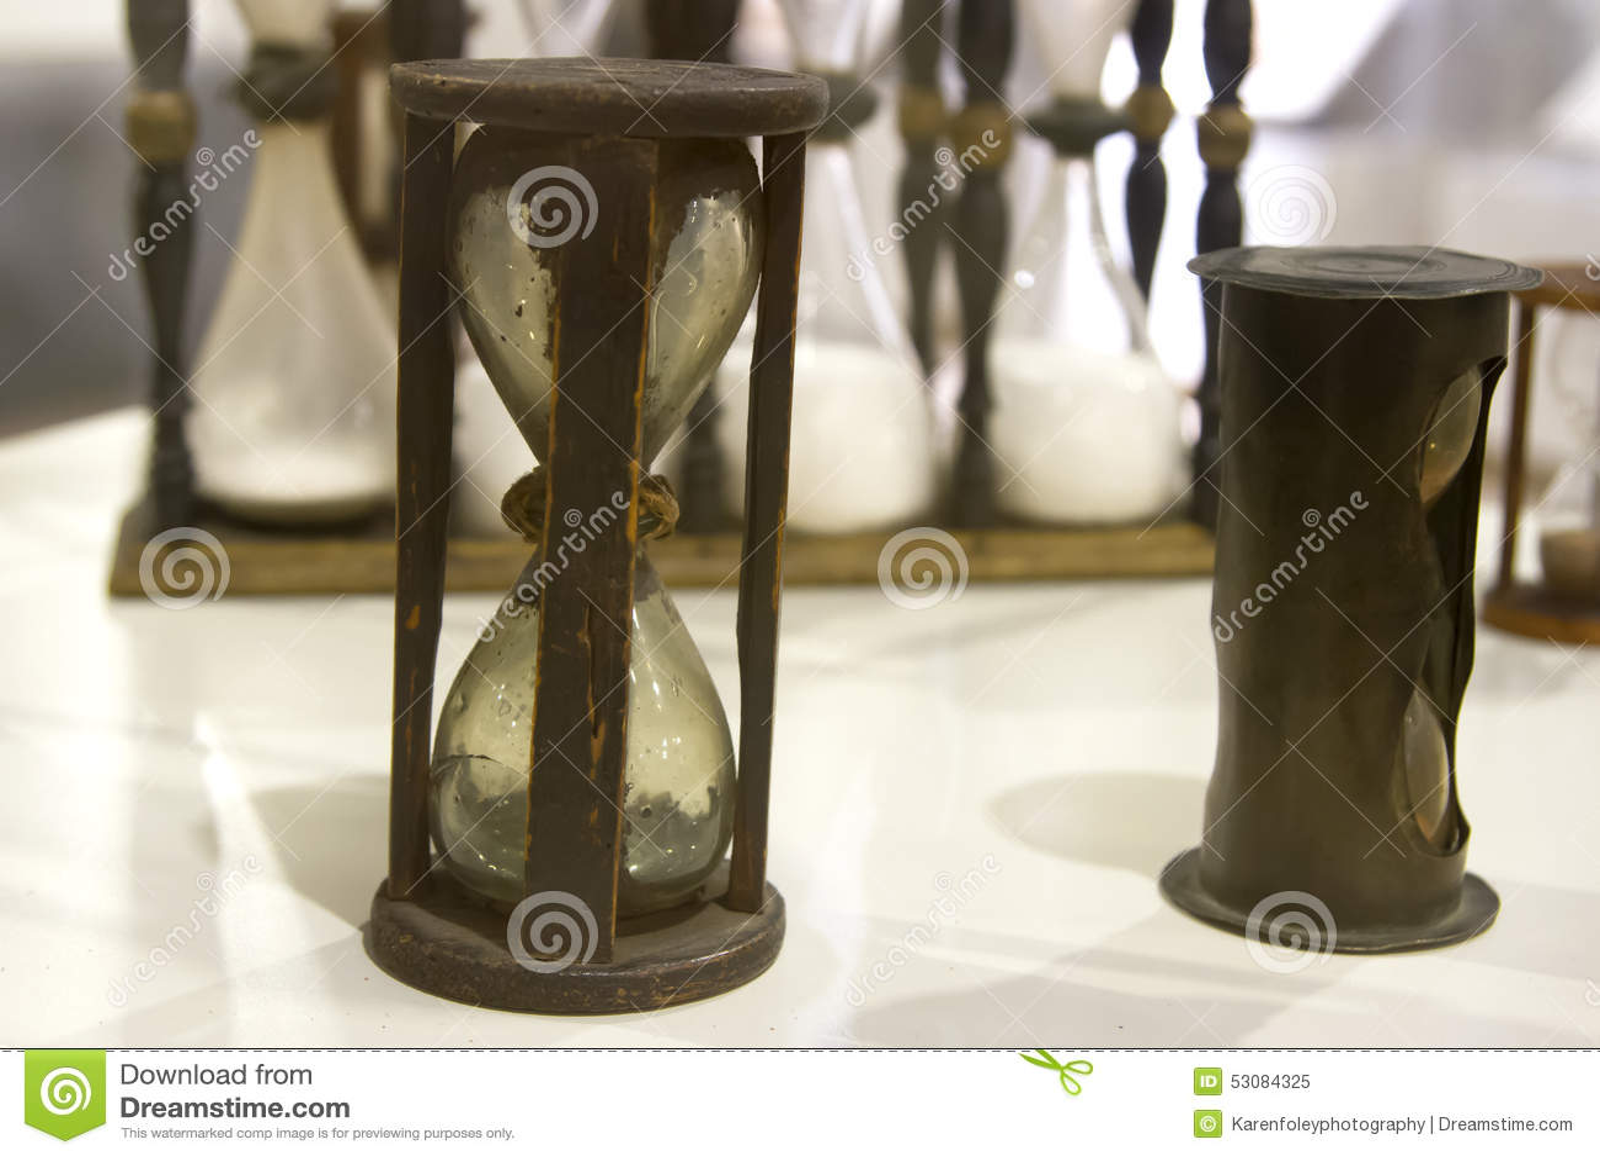 Reloj De Arena Antiguo Imagen De Archivo Imagen De Wooden 53084325